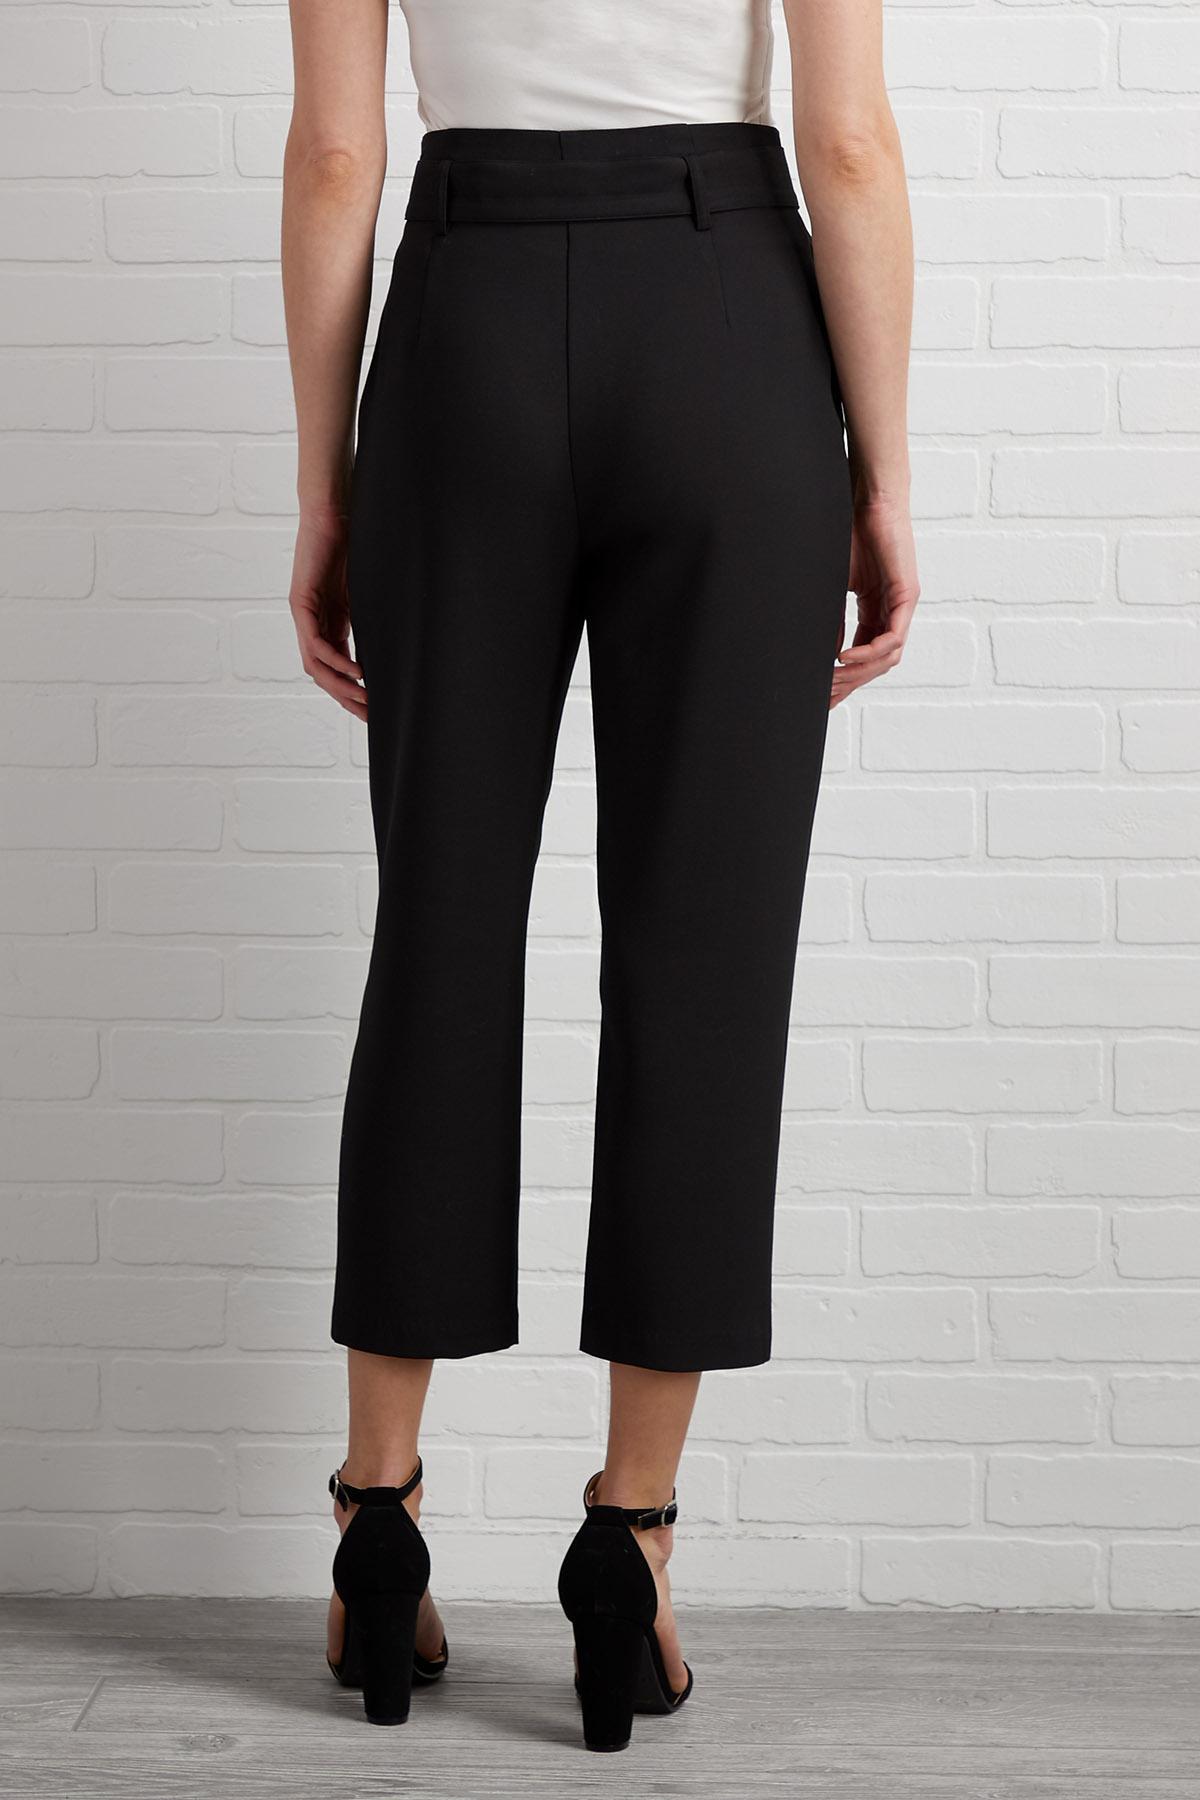 Never Belt So Good Pants